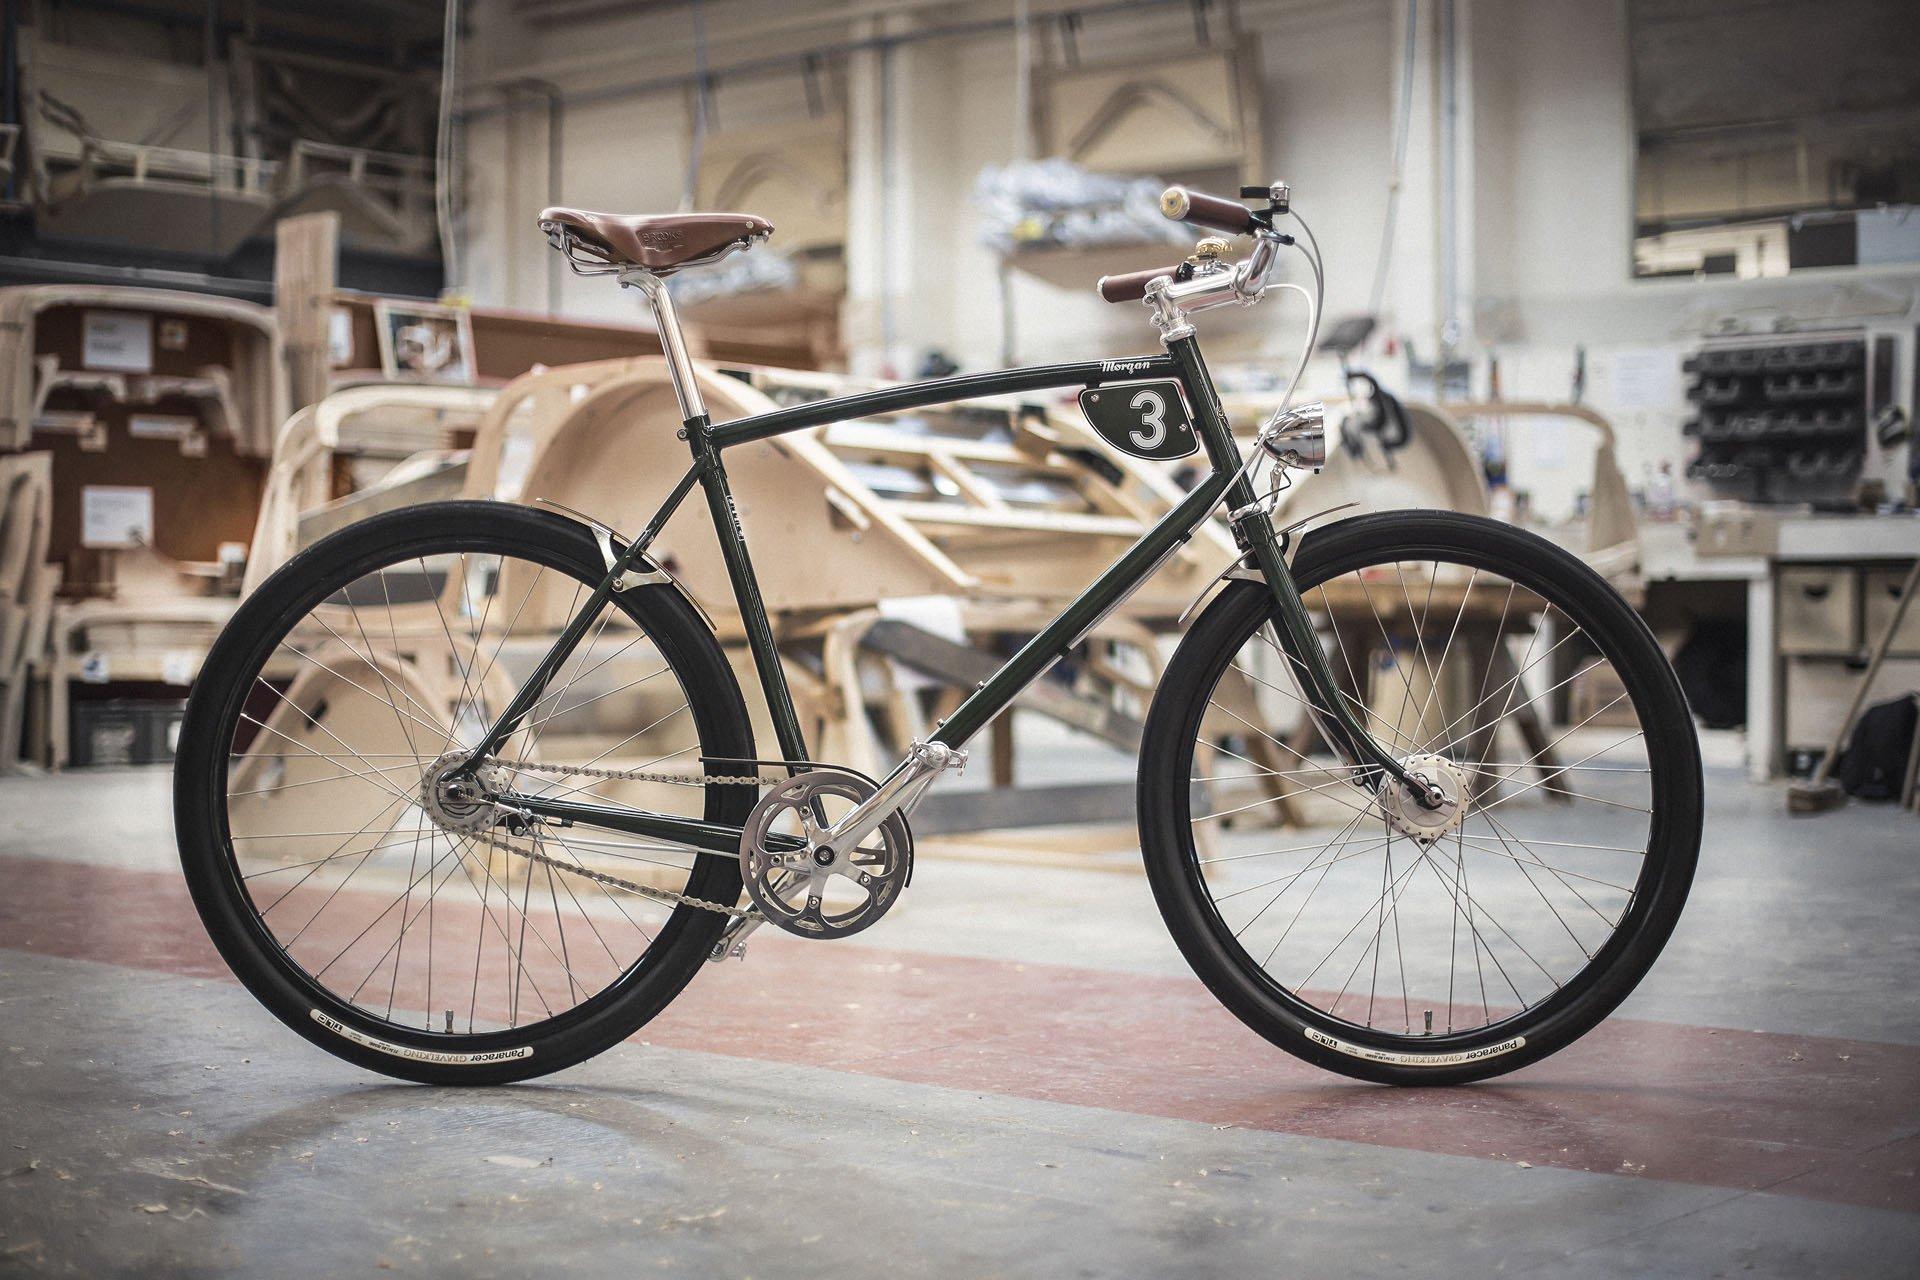 Pashley-Morgan_bicycles_02